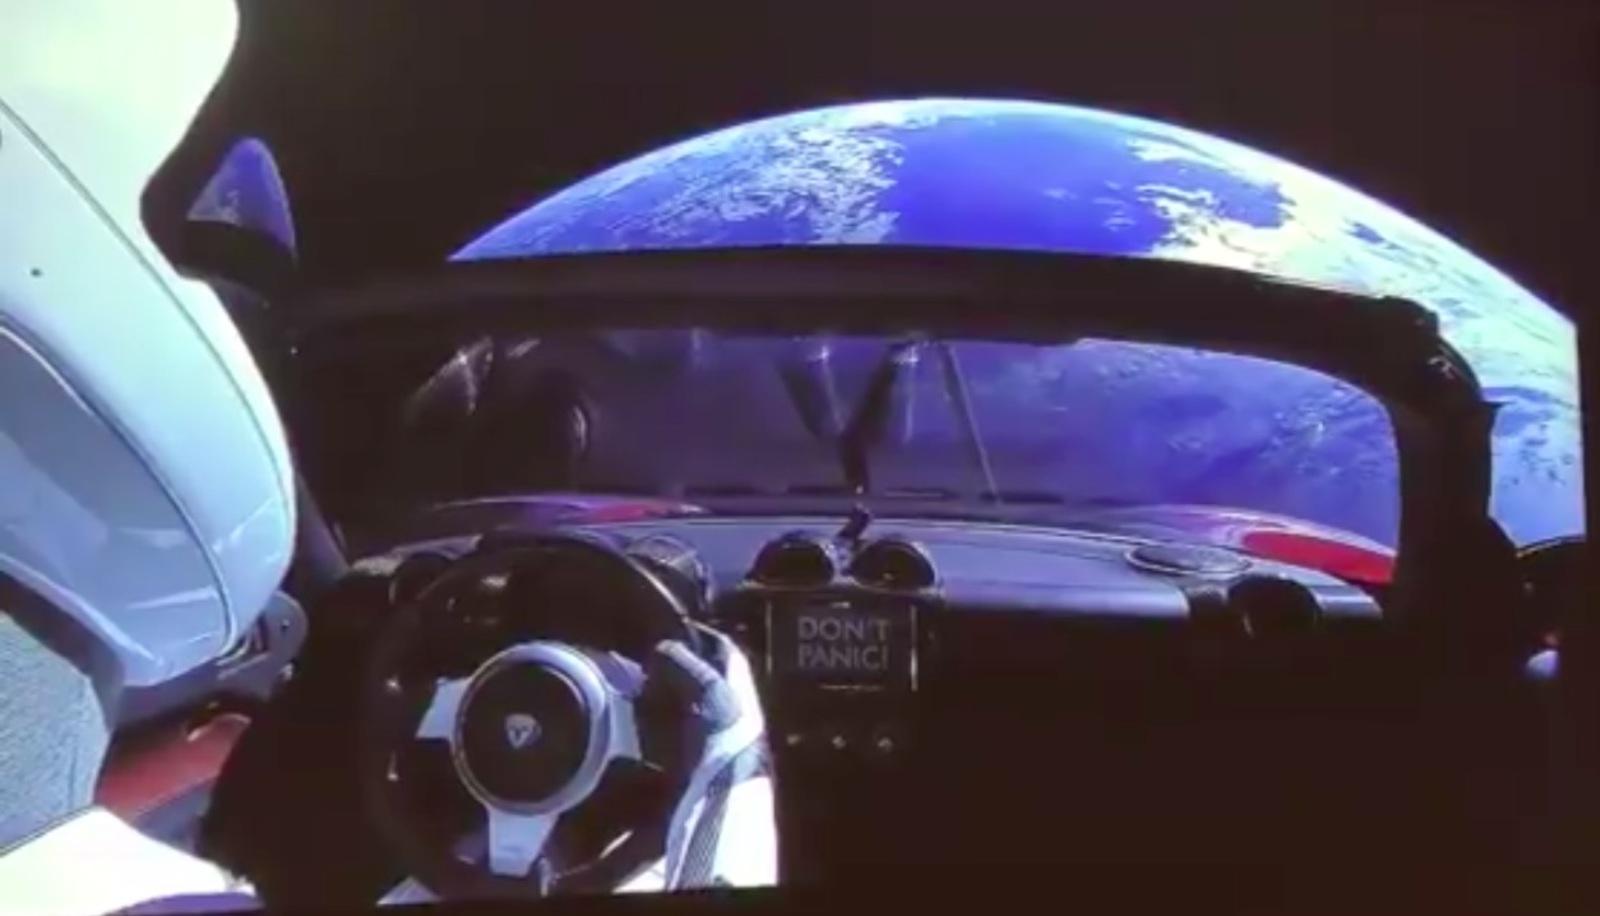 Спорткар Илона Маска: упадет ли он на Землю